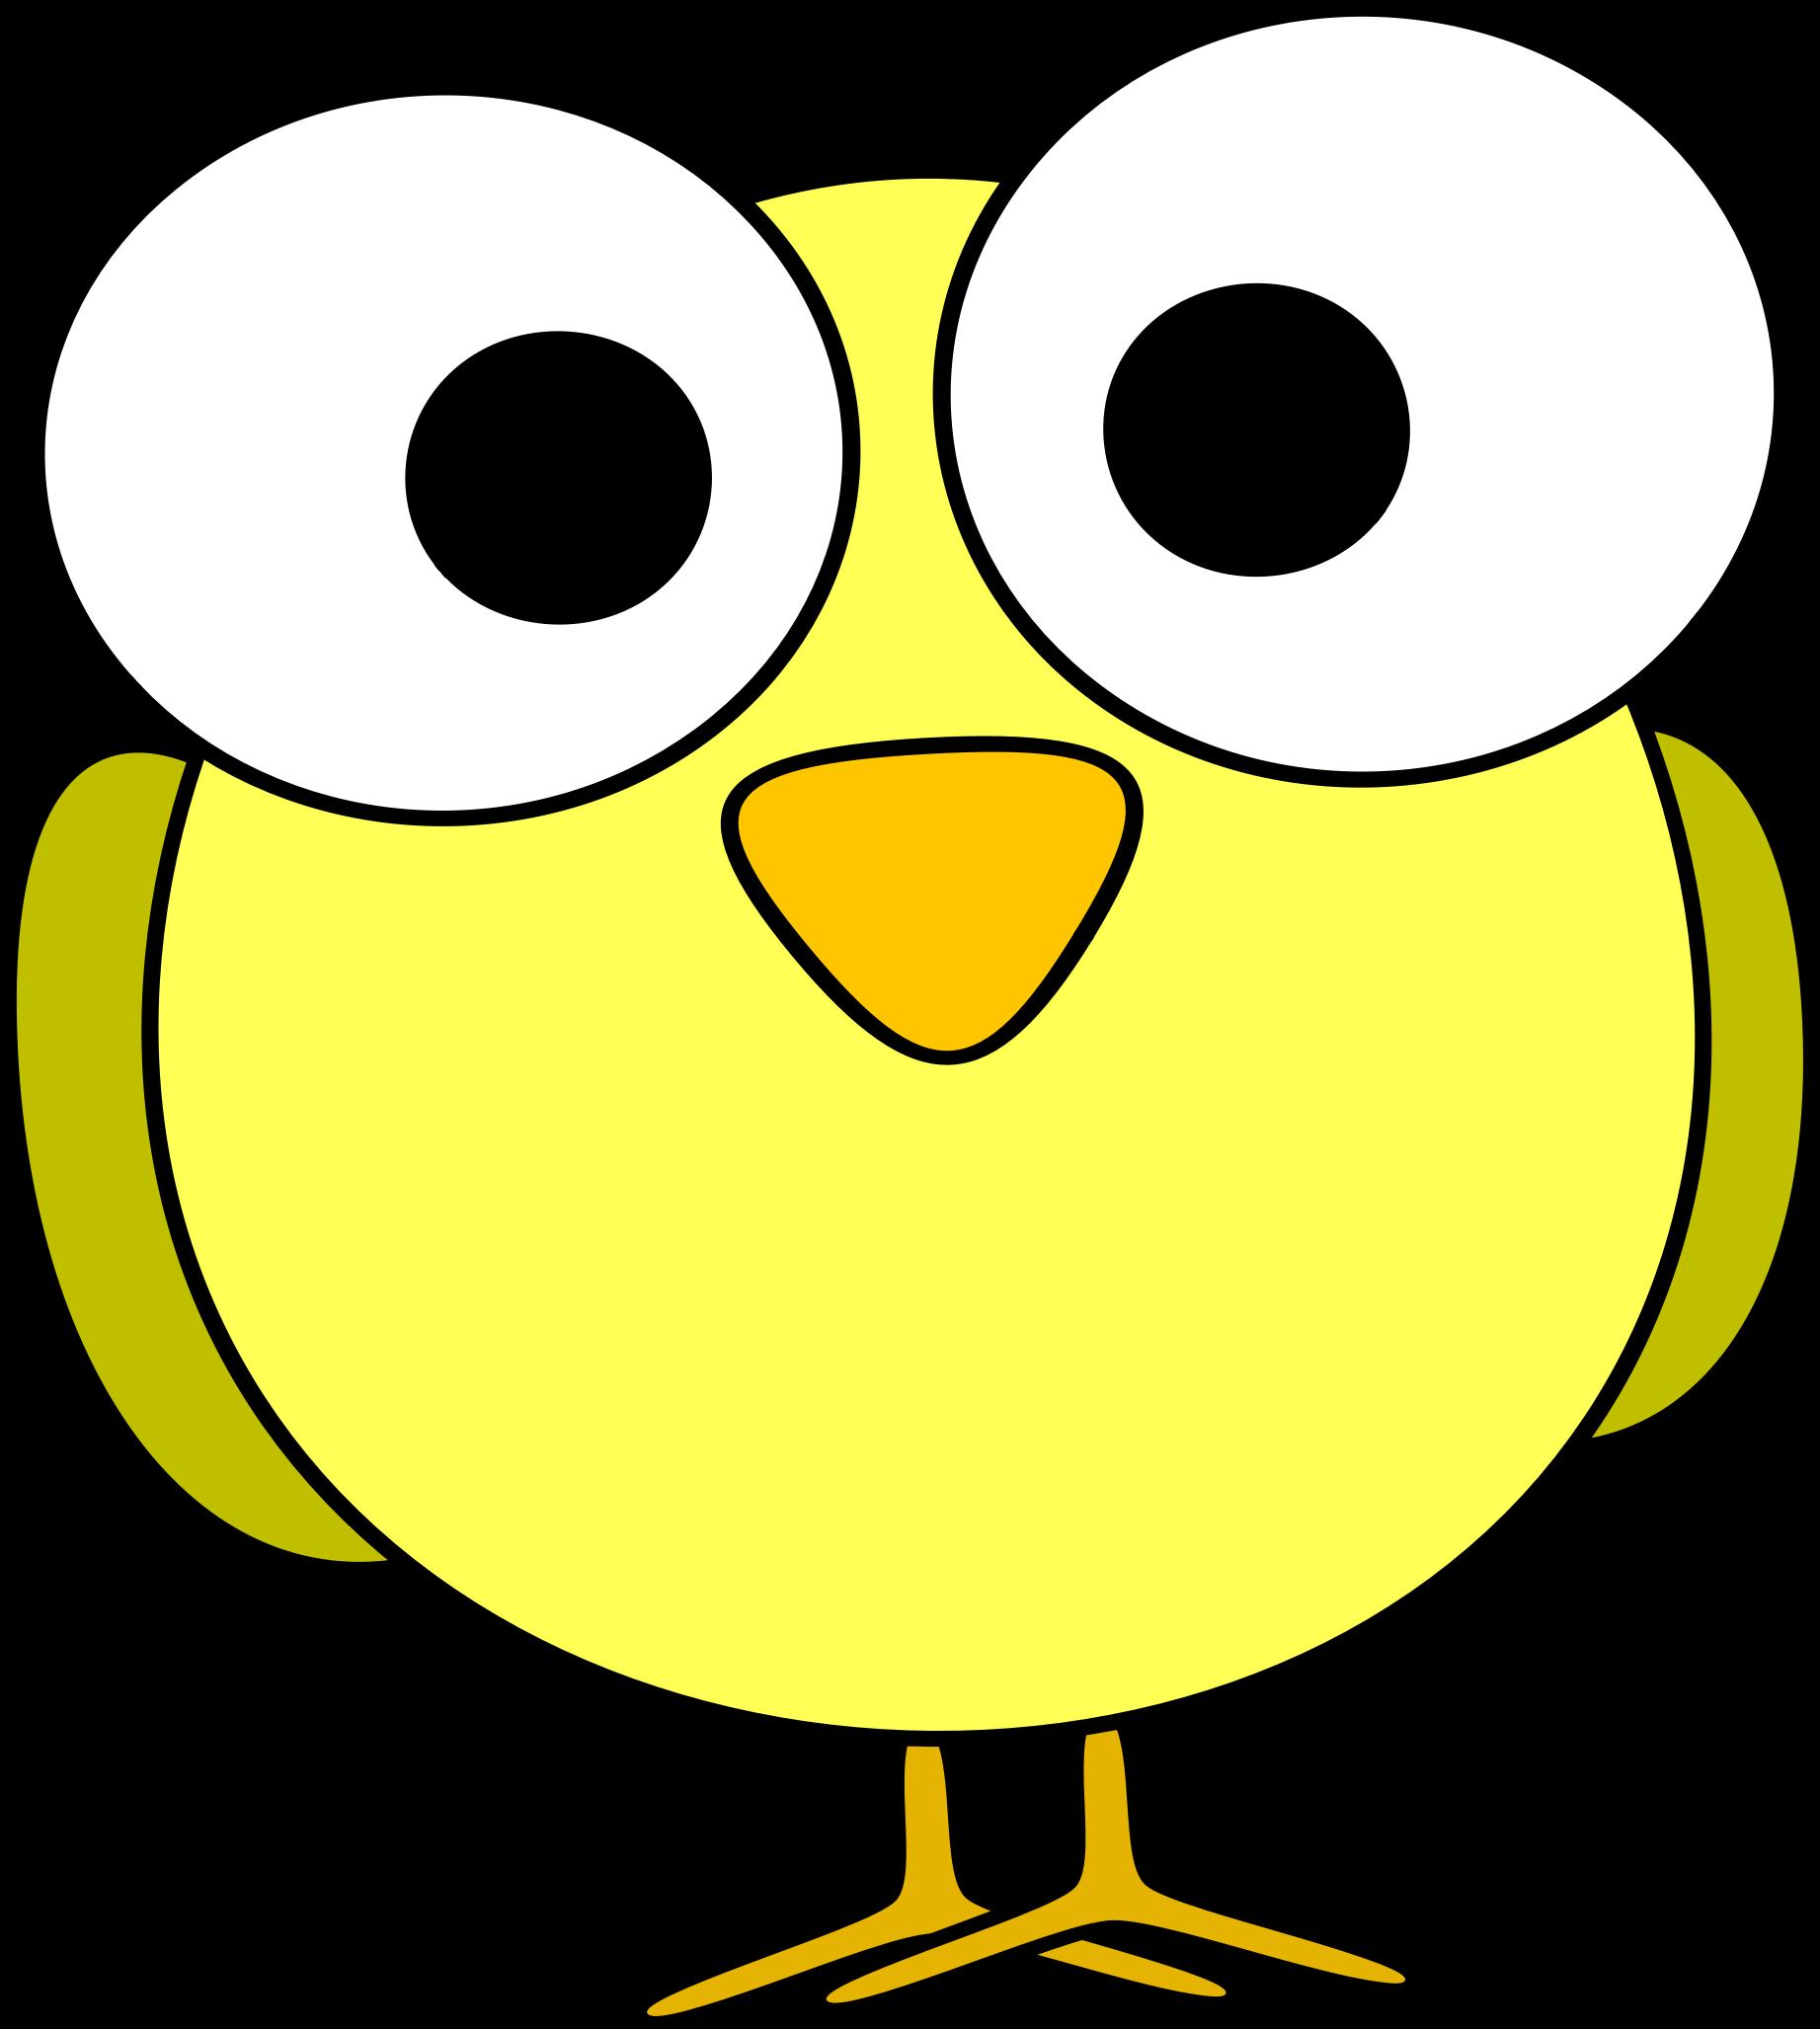 Googley eye bird big. Clipart birds yellow